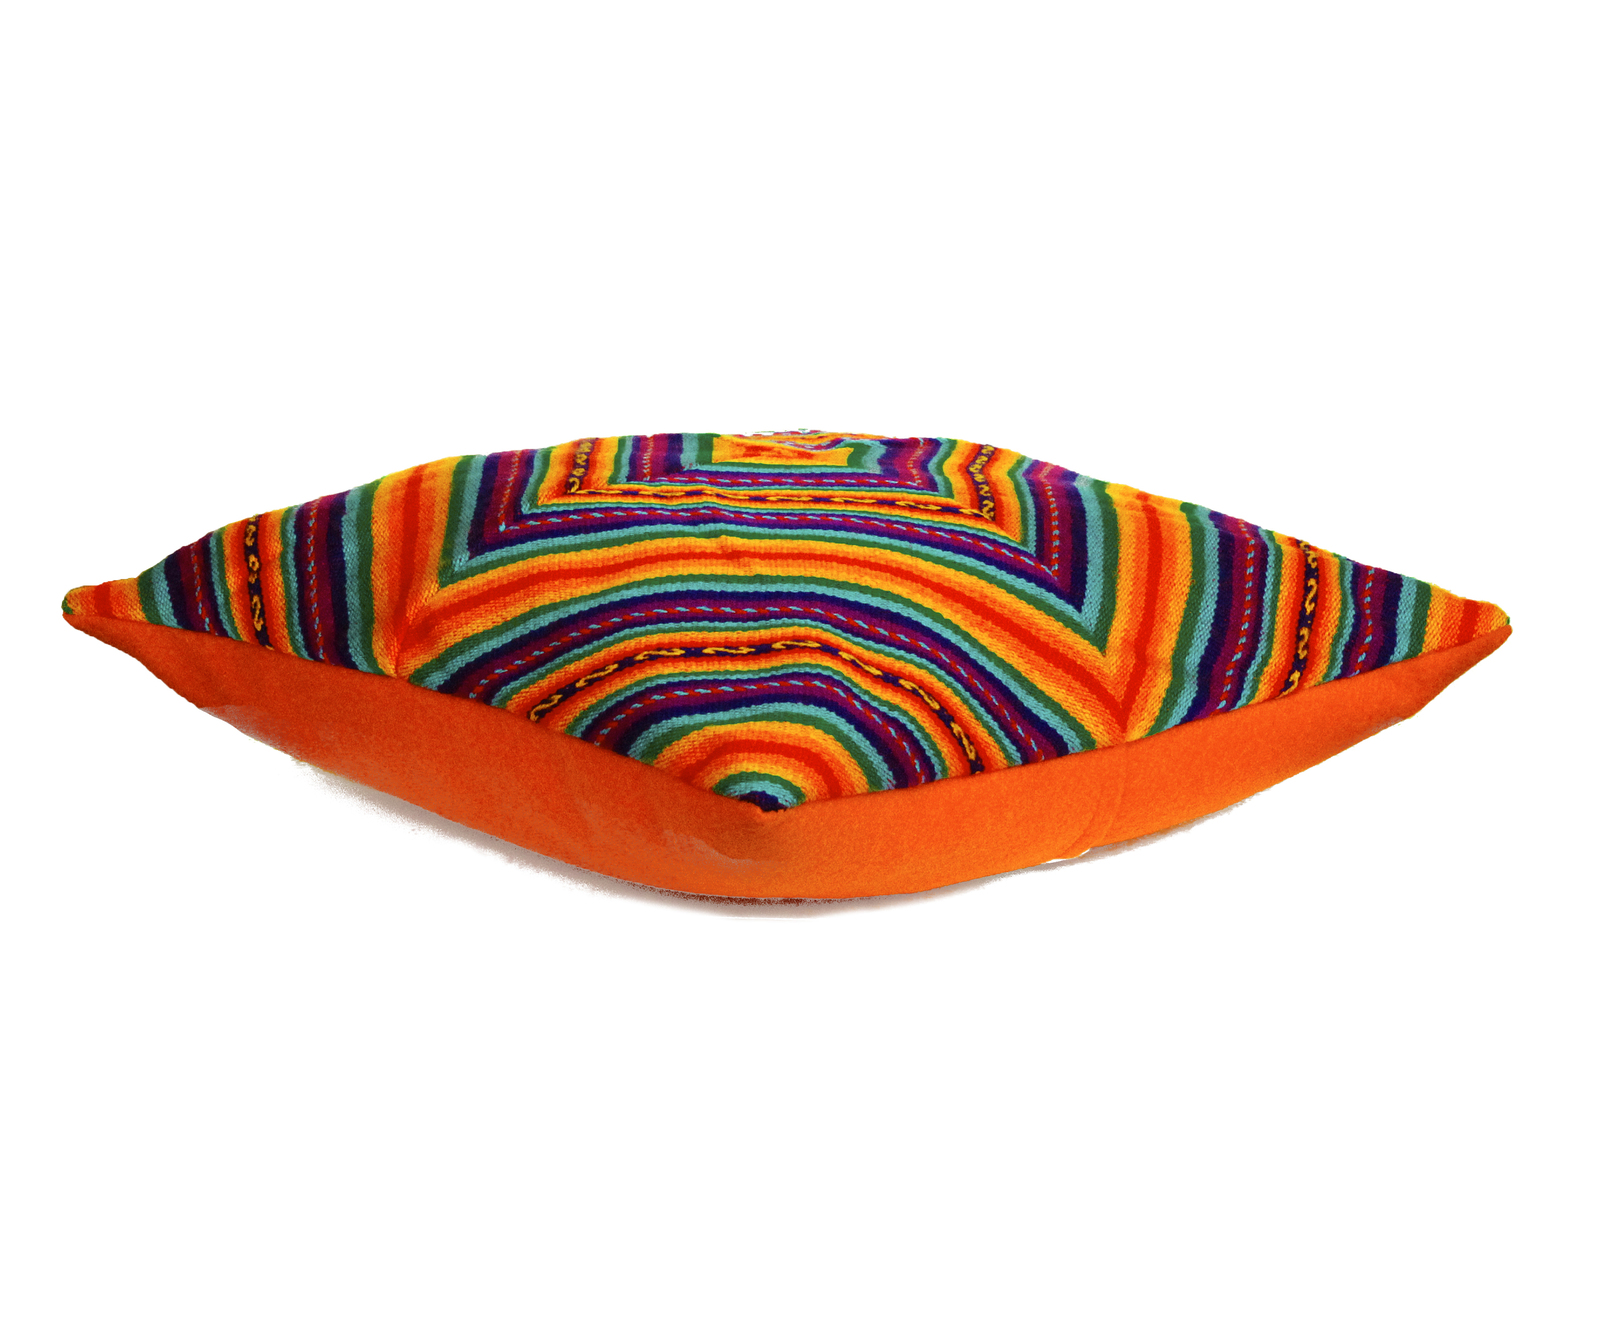 Rainbow PERUVIAN Cushion Cover, throw pillow, ethnic cushion, boho decor image 3